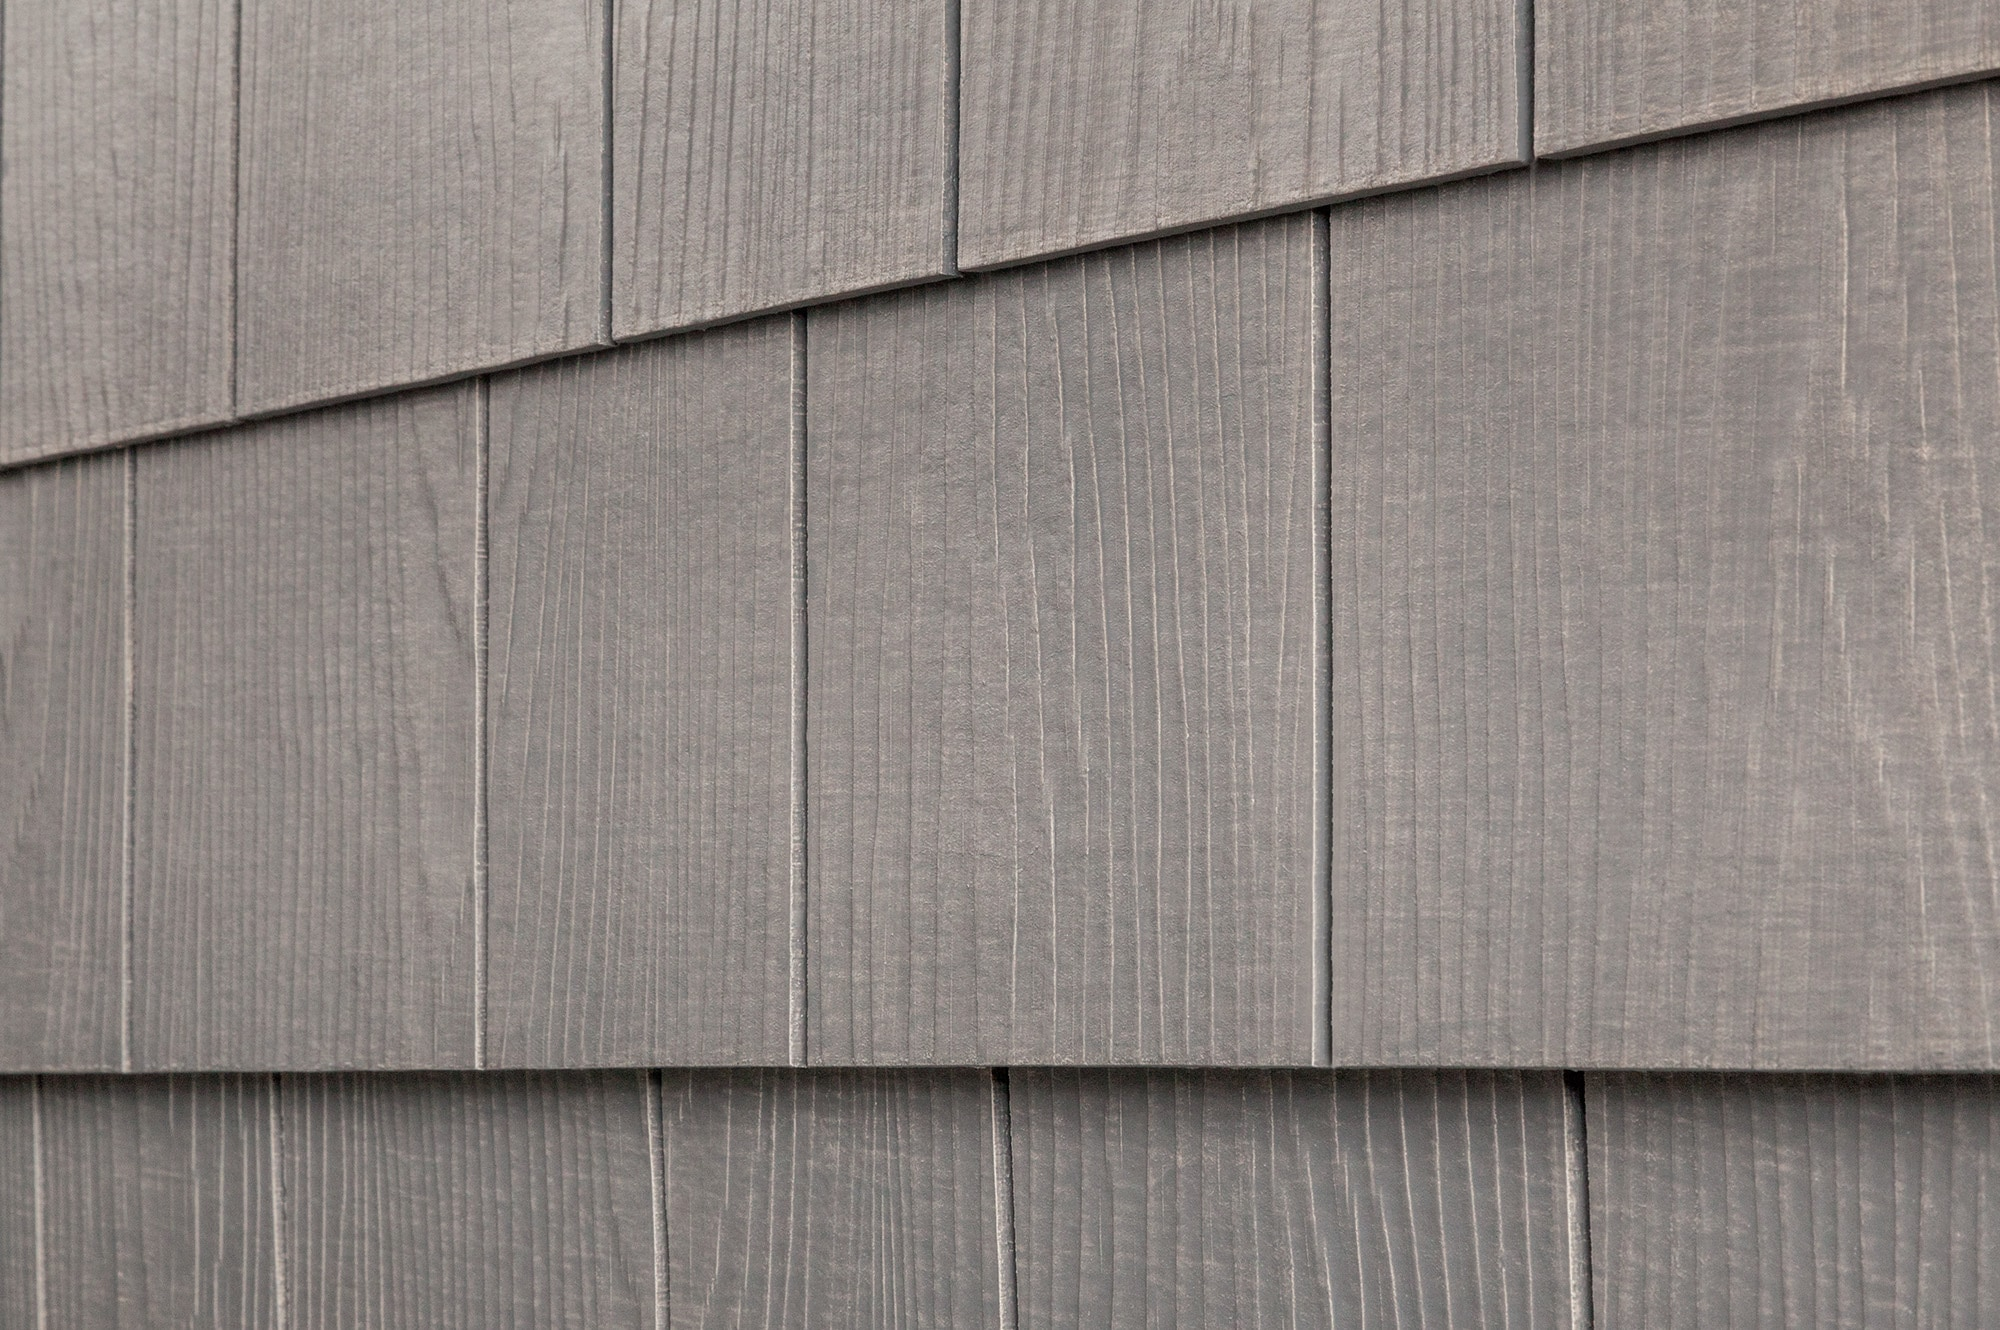 100 types of siding materials 23 benefits of fiber cement for Fiber cement siding vs vinyl siding cost comparison